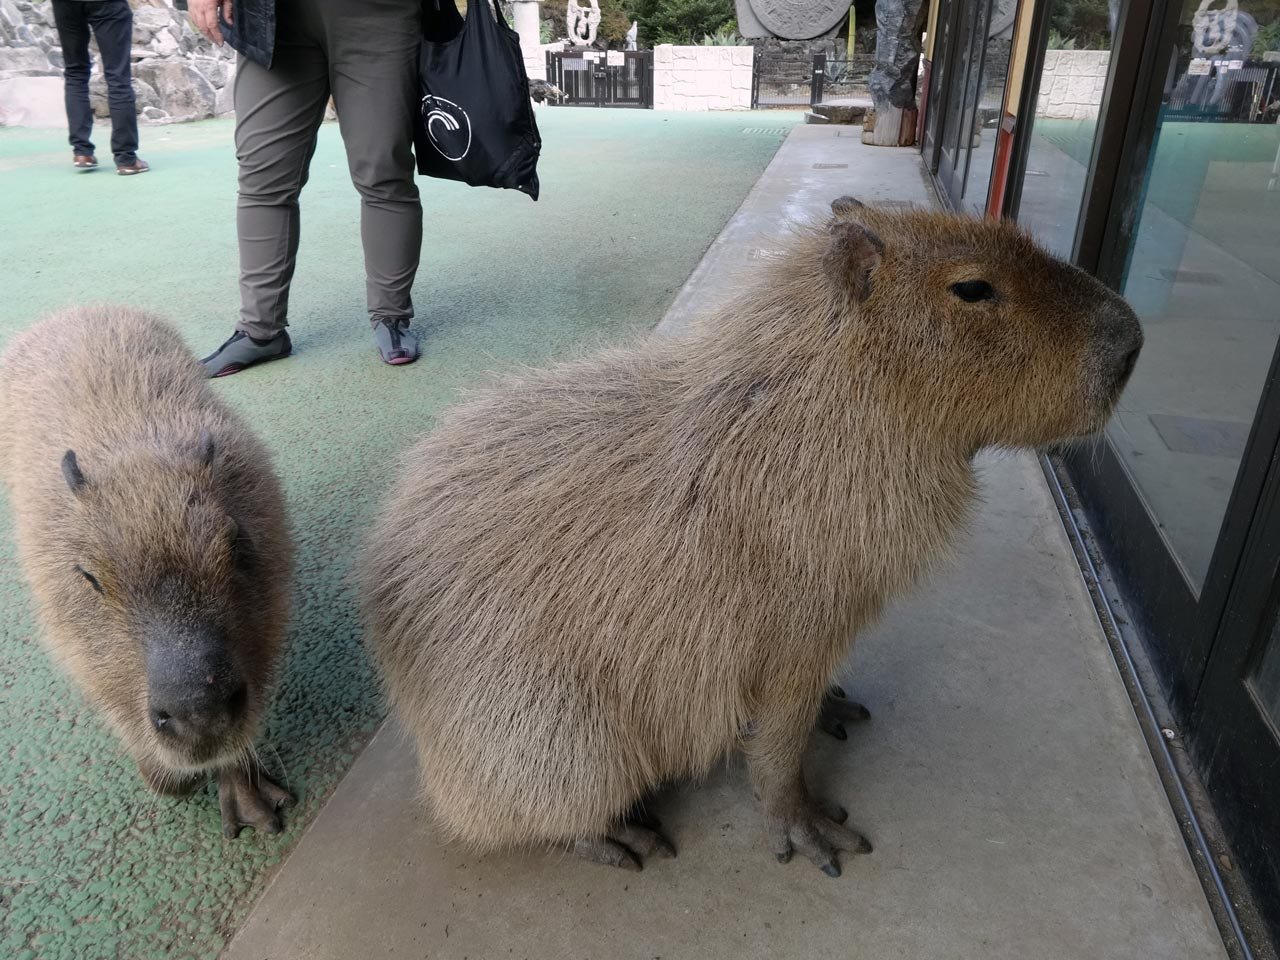 two capybara wiating by a door